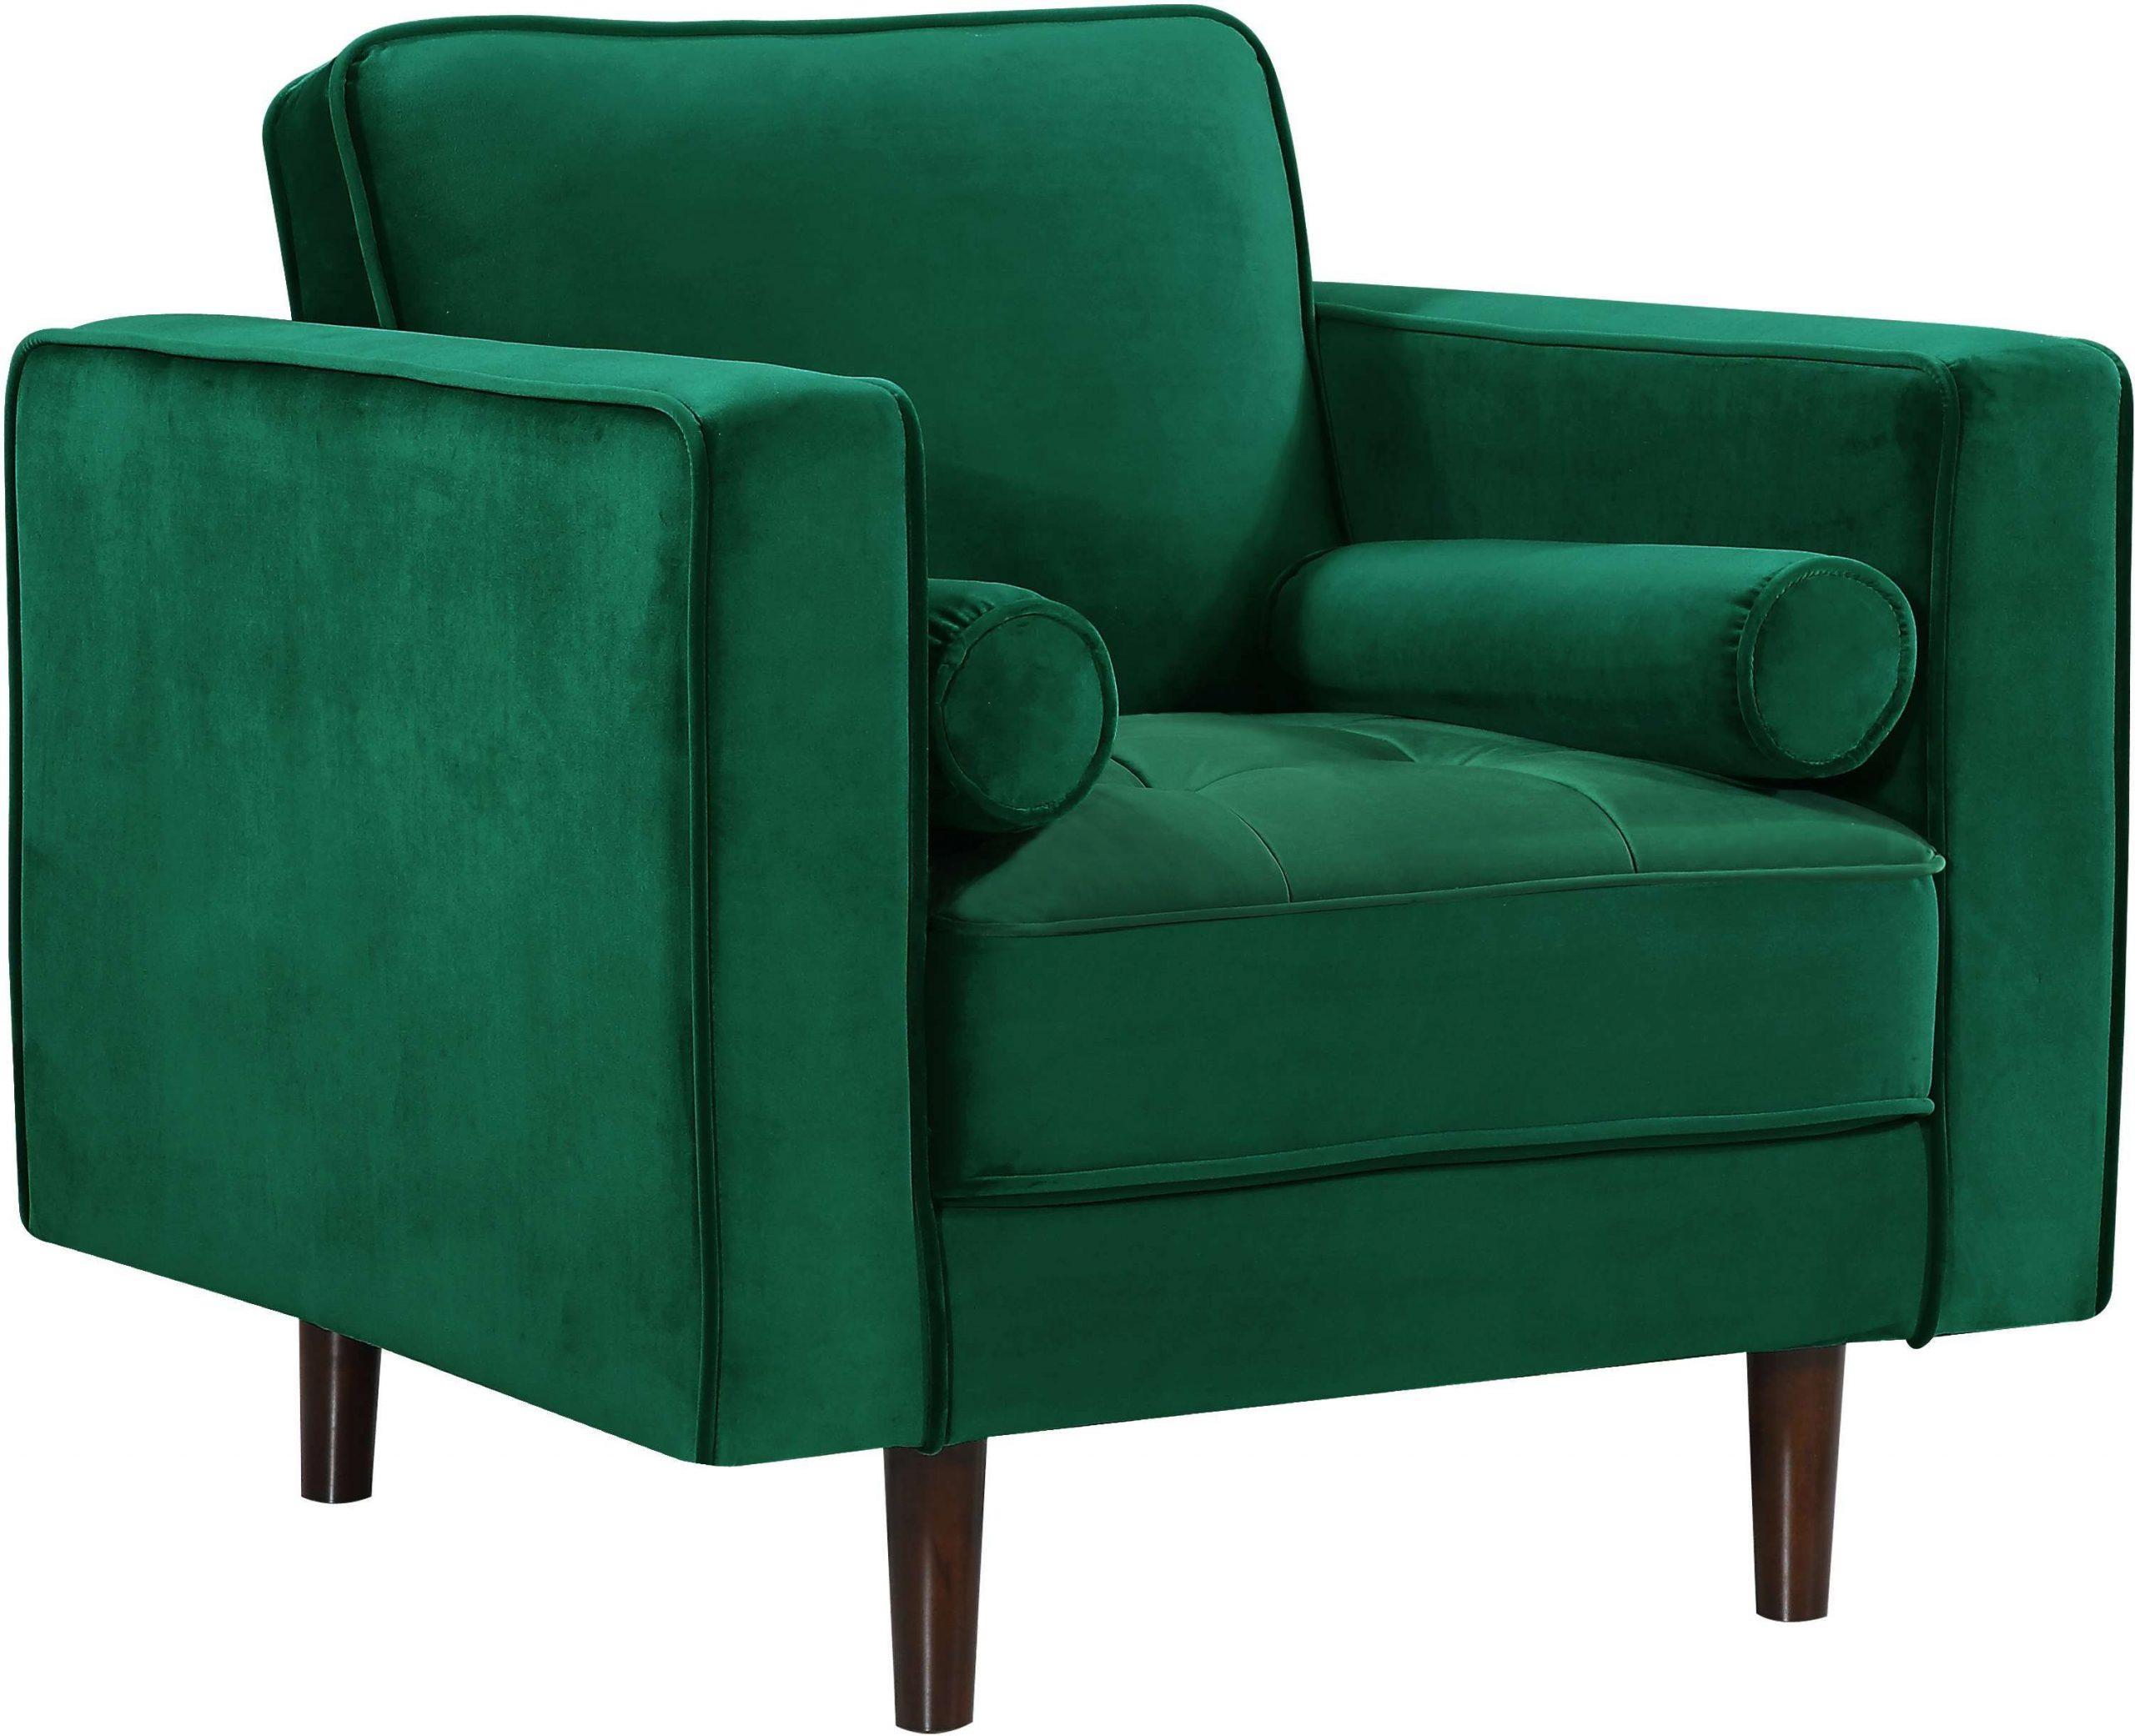 Park Art My WordPress Blog_Green Velvet Accent Chair Target